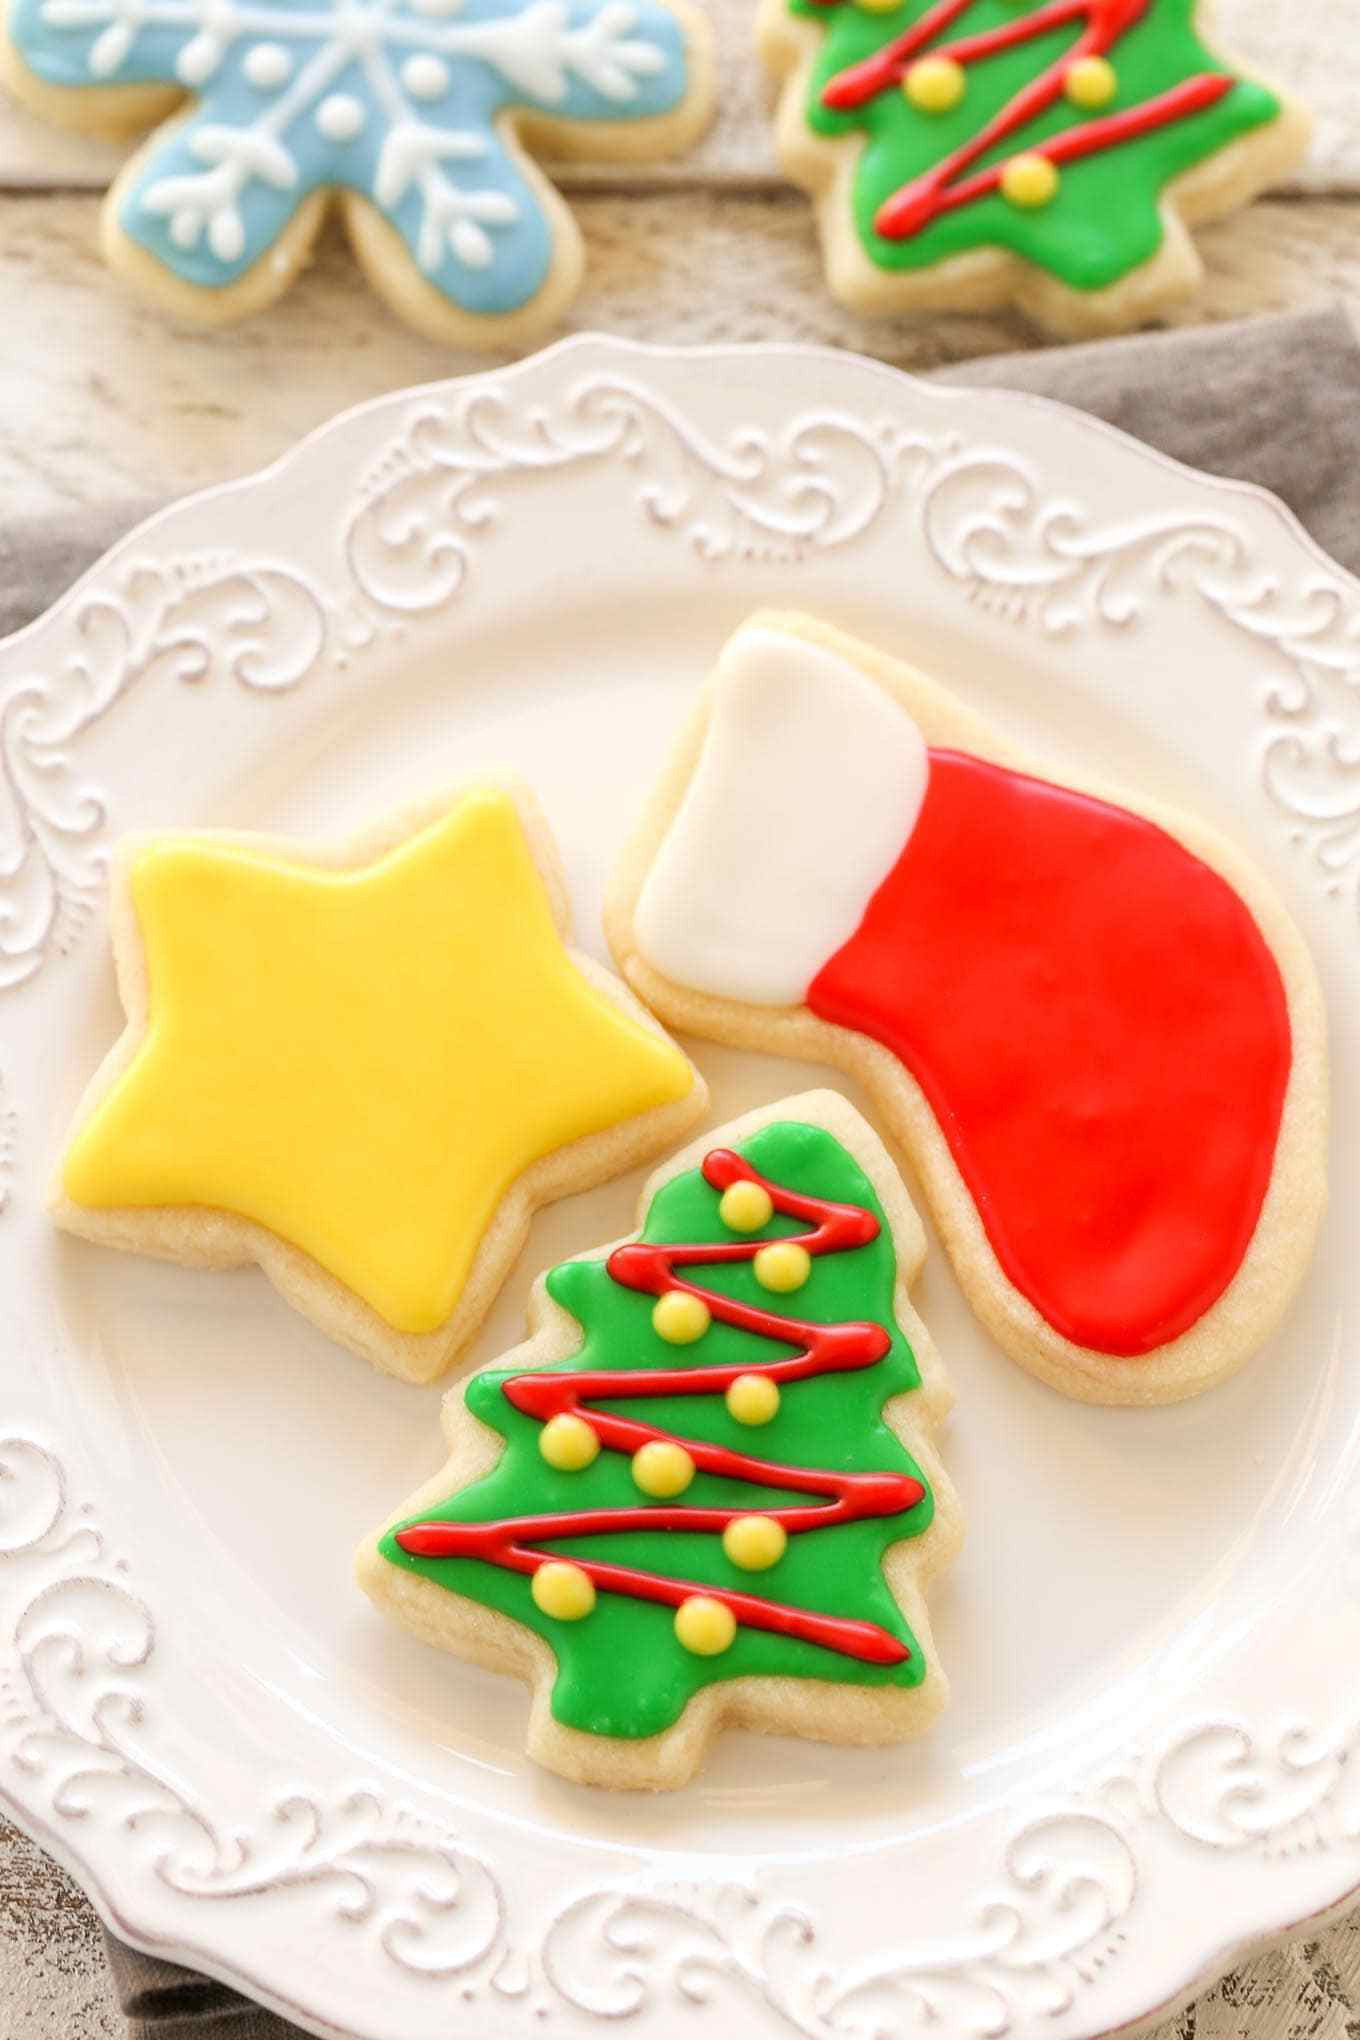 Sugar Cookies Recipe Christmas  Soft Christmas Cut Out Sugar Cookies Live Well Bake ten